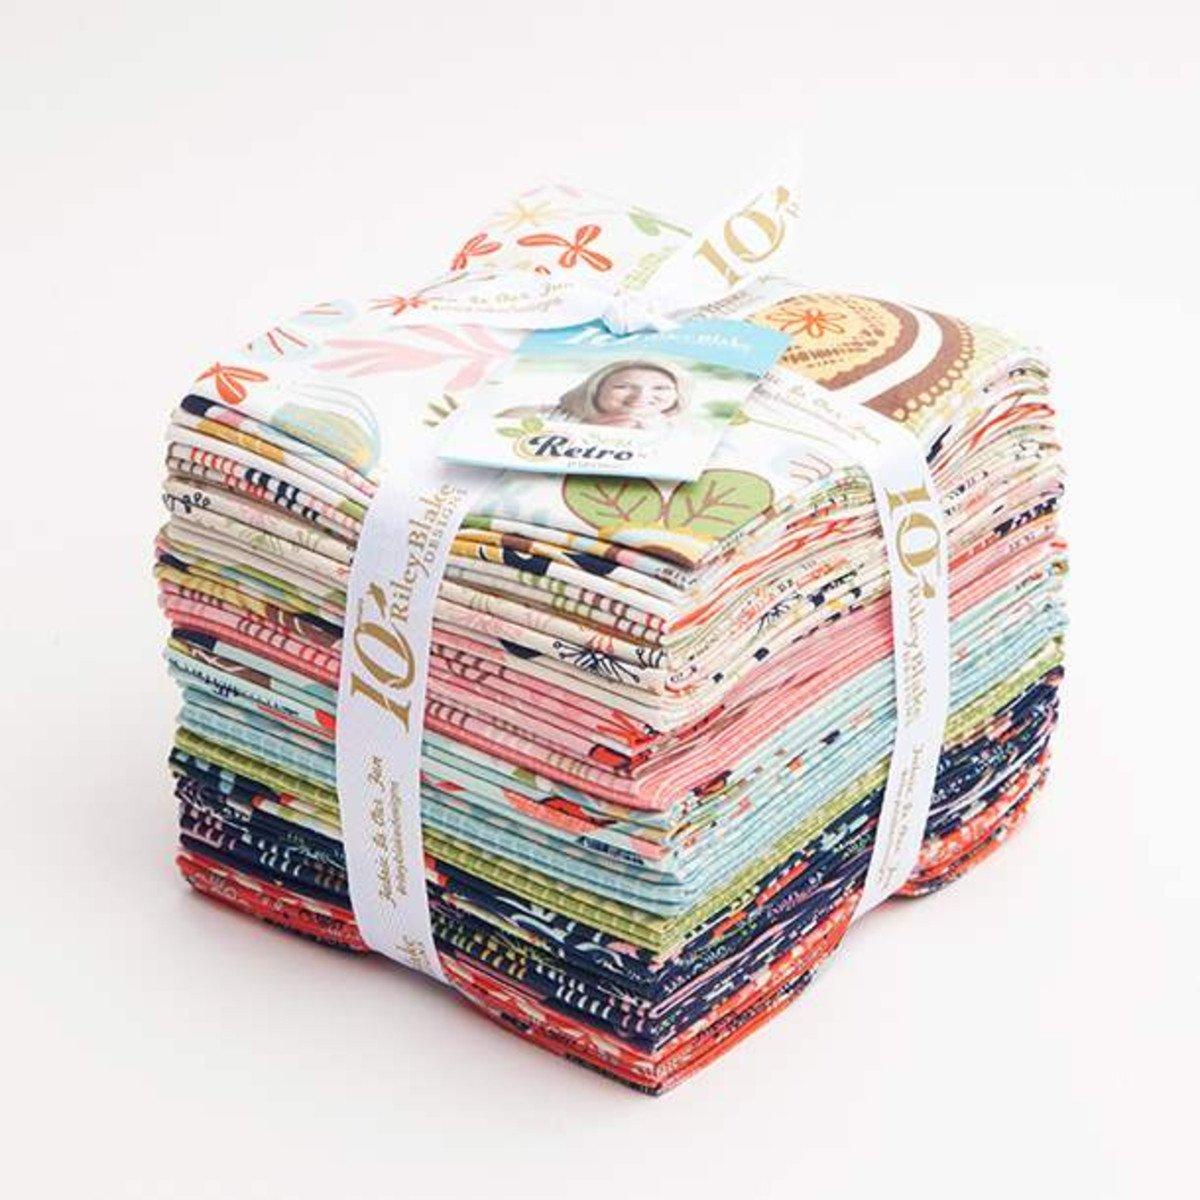 Sew Retro Fat Quarter Bundle 24pcs